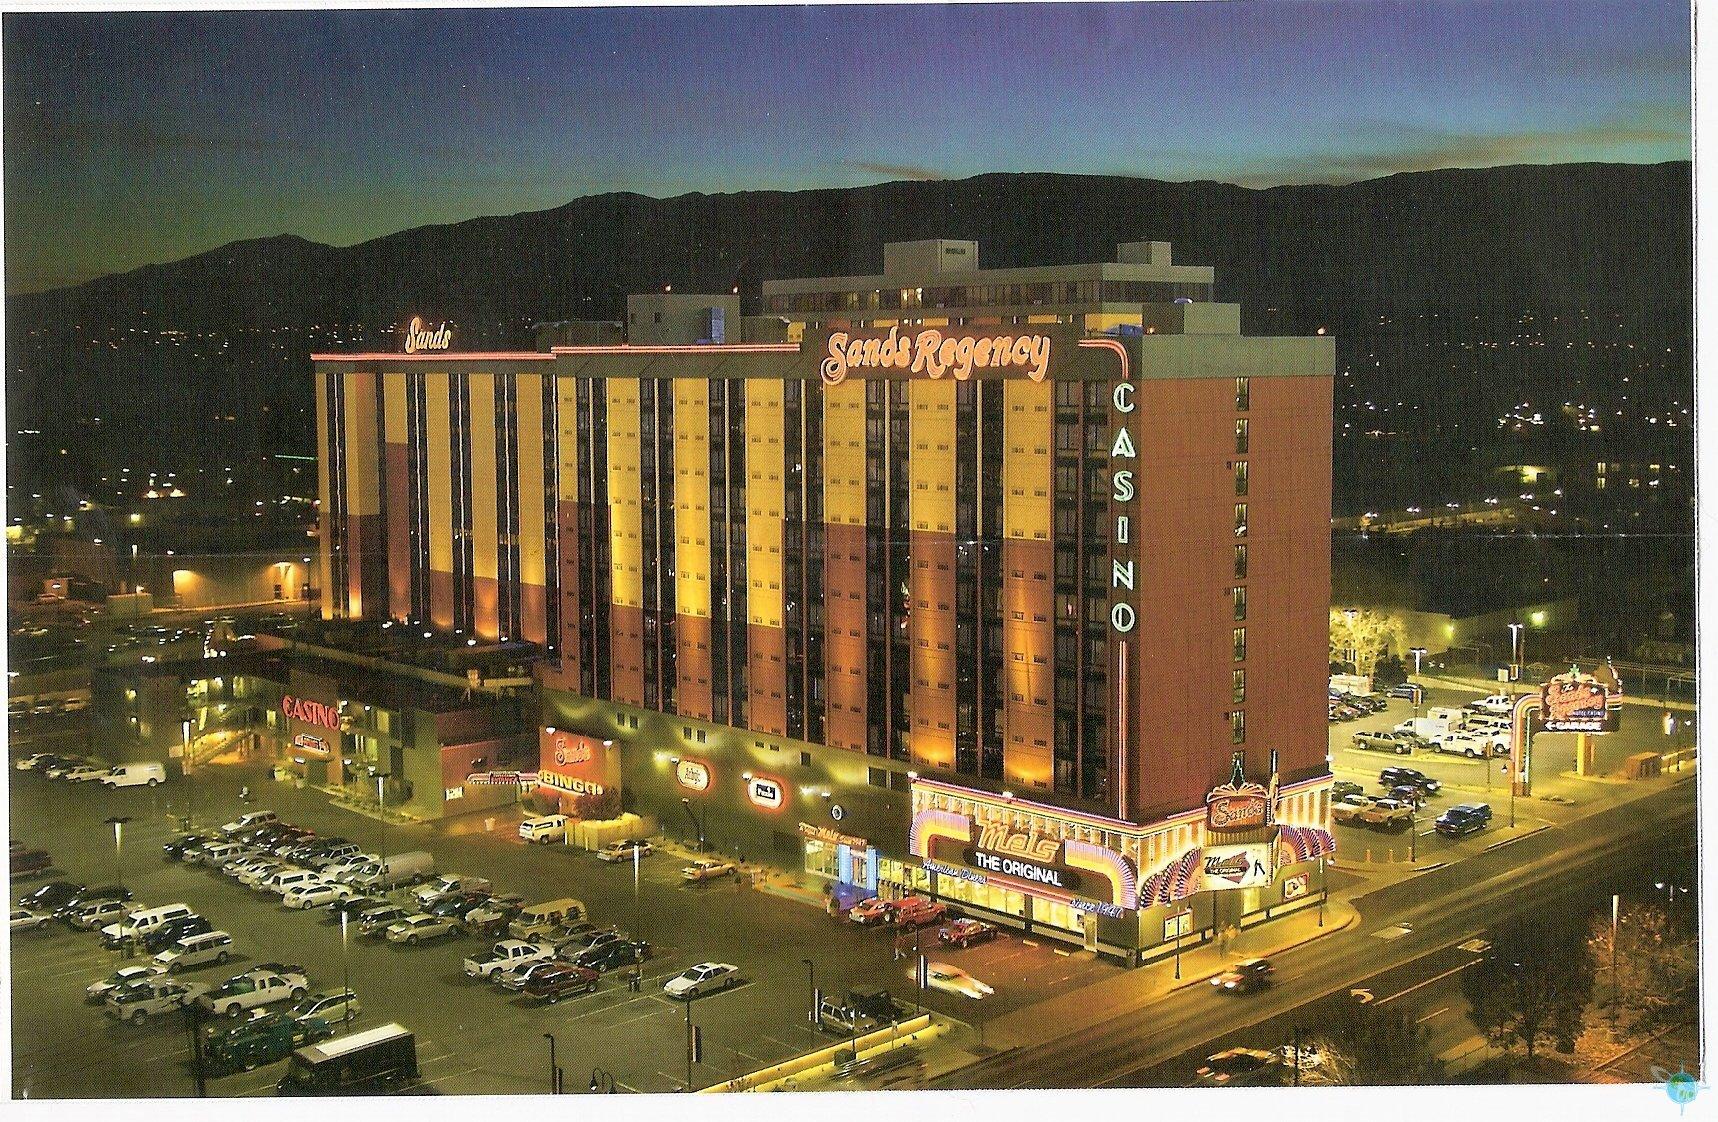 Algiers hotel casino vincere sicuro casino online